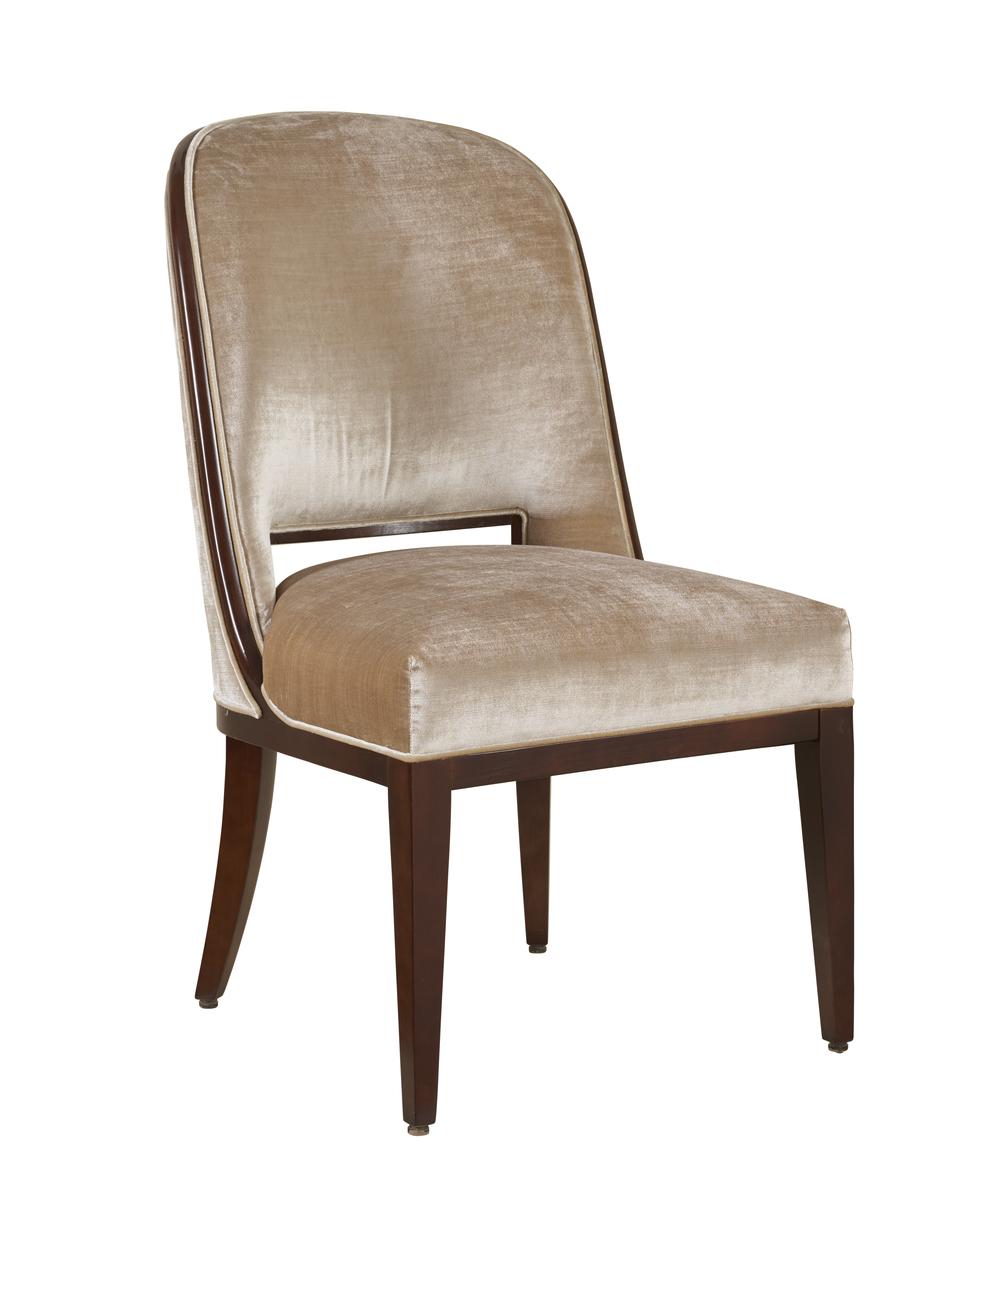 Designmaster Furniture - Barton Side Chair